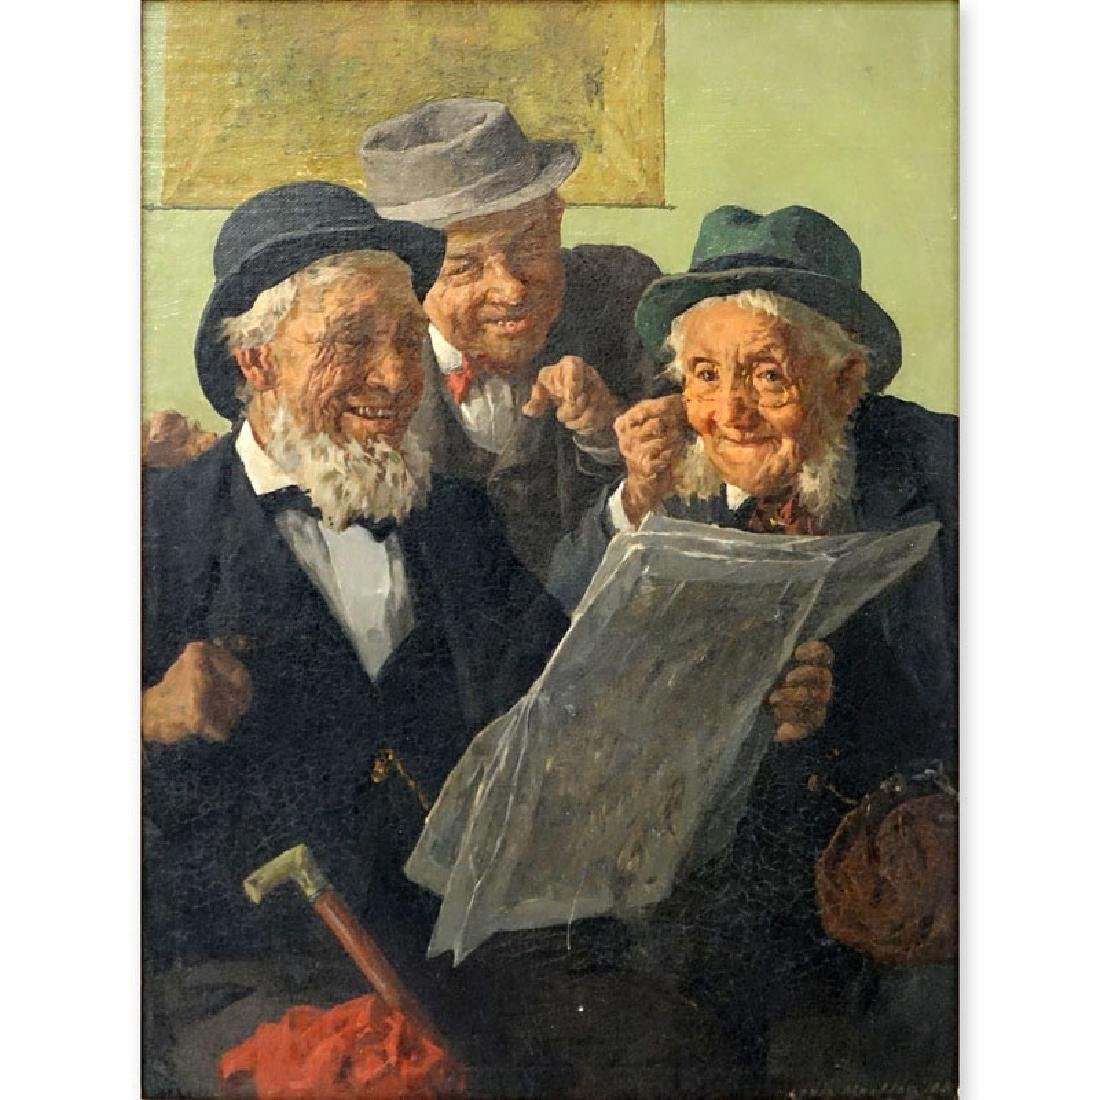 Louis Muller (19/20th C.) Oil on Canvas, Old Men